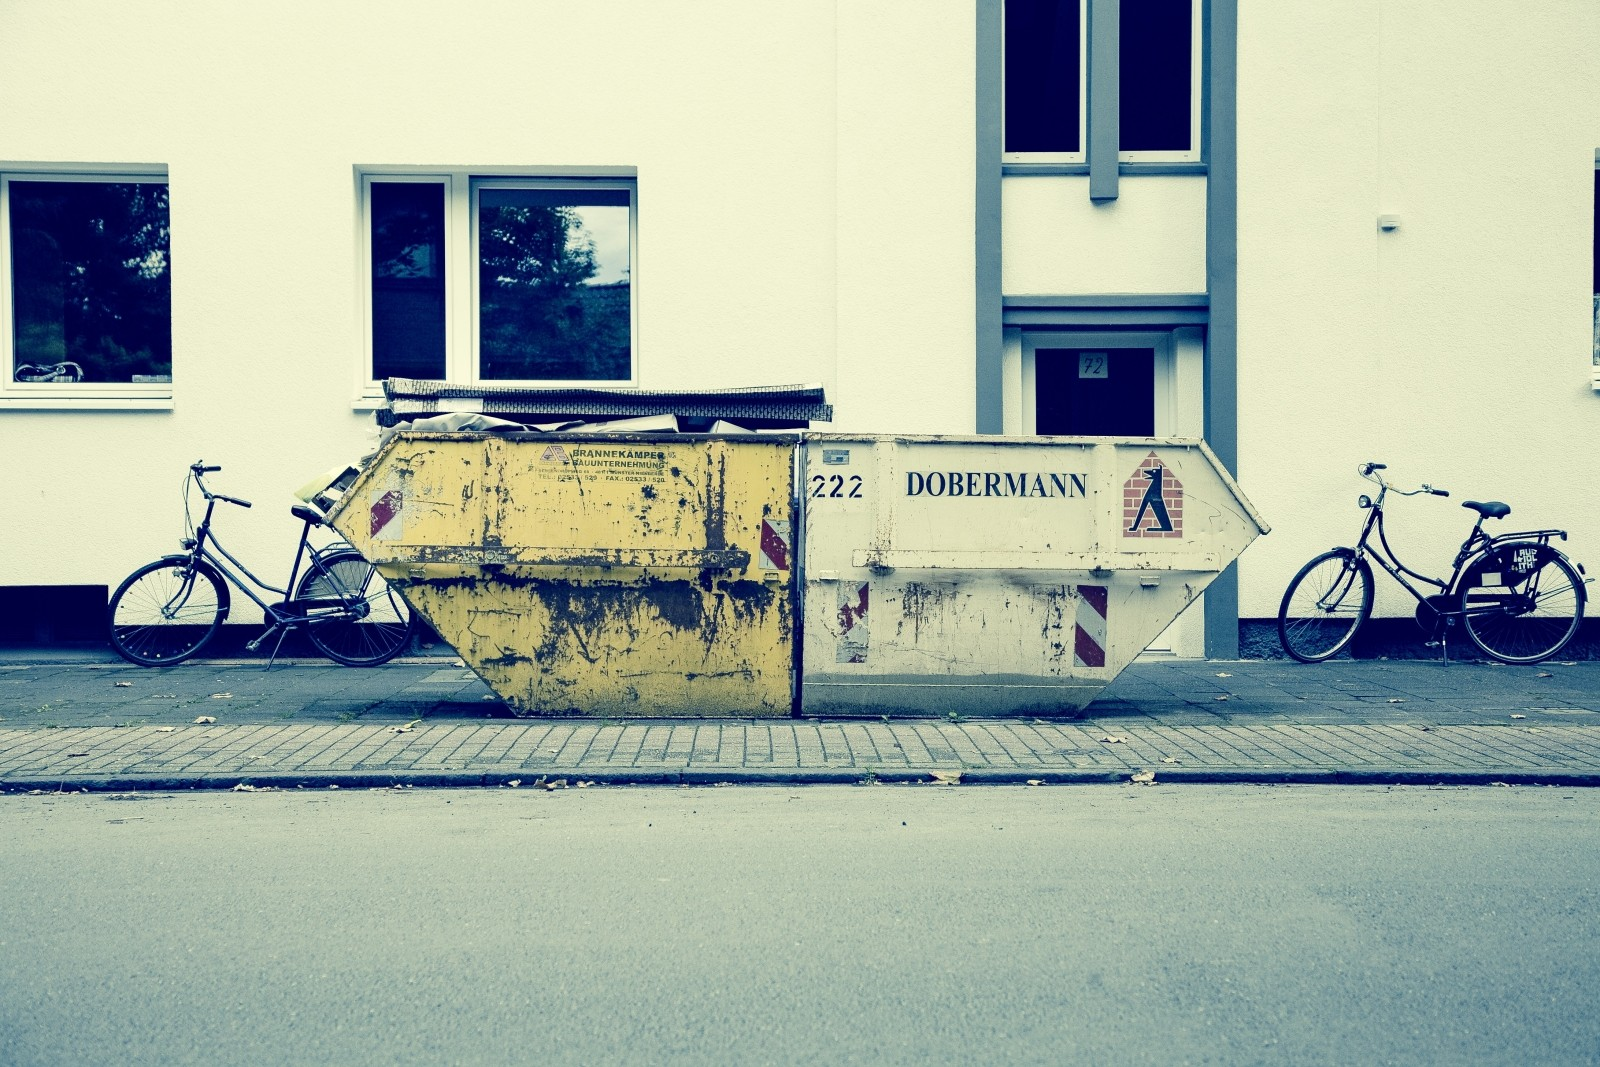 waste-container-garbage-wheel-bike-wheels-bicycles